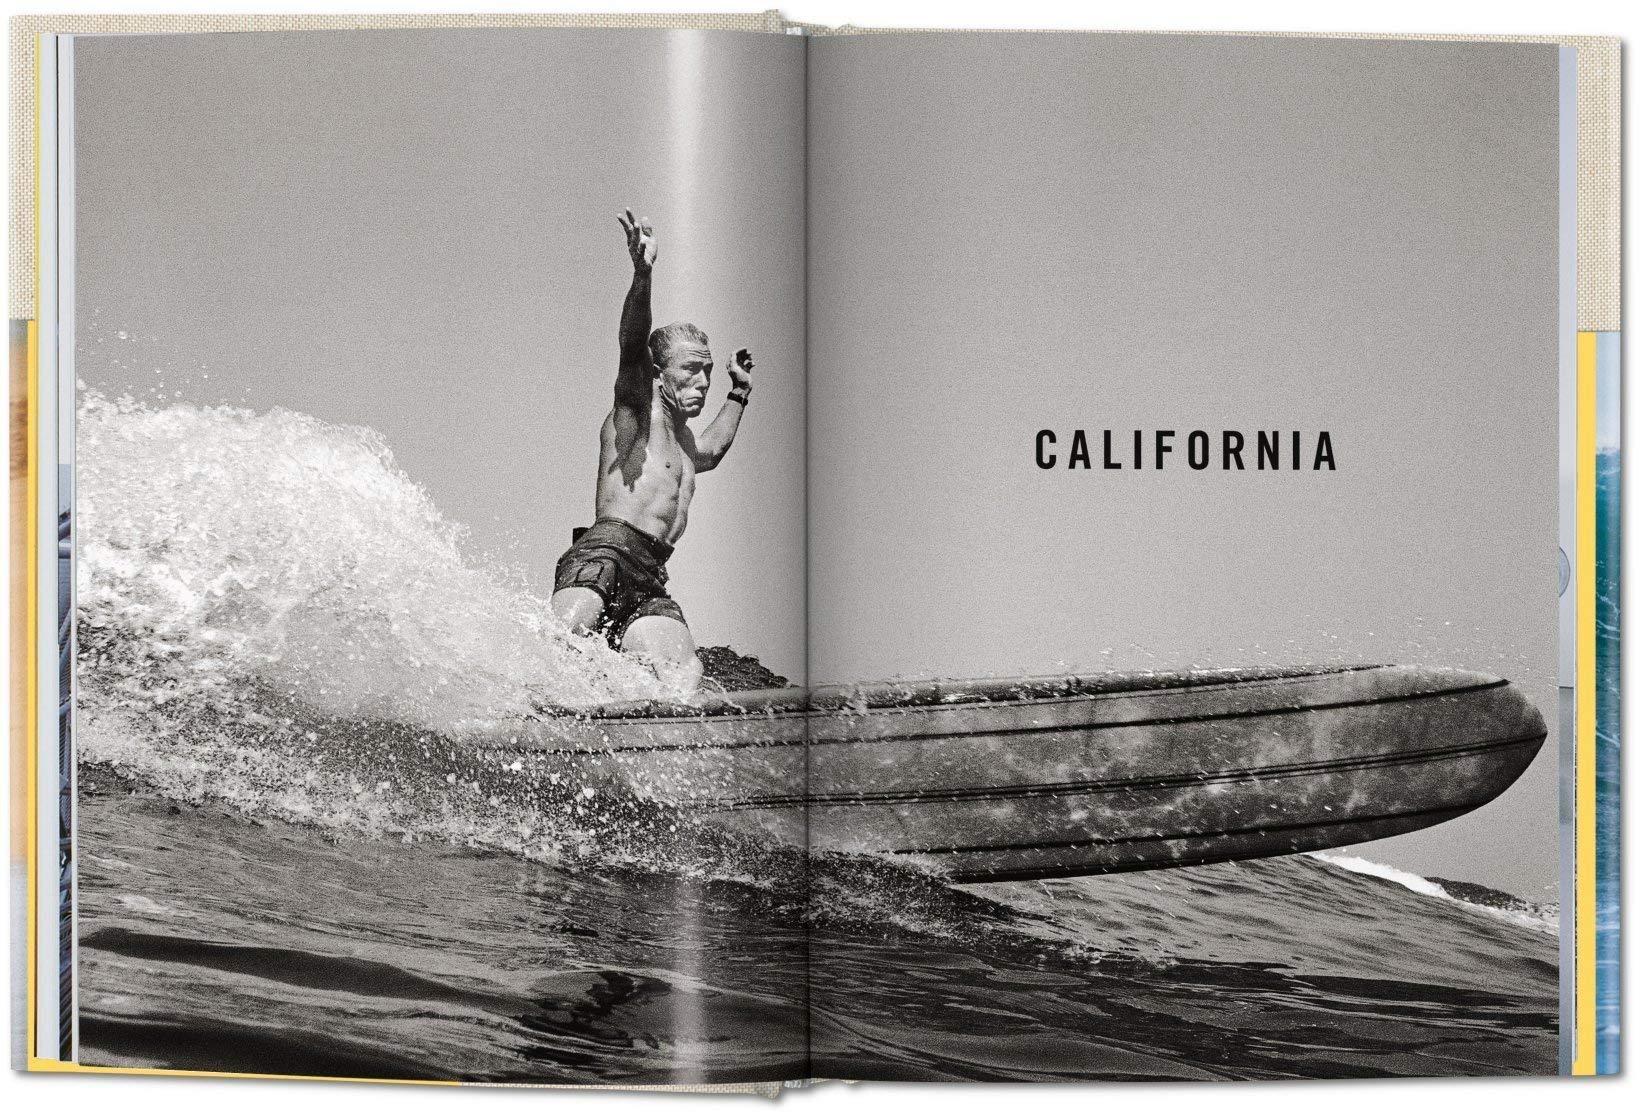 LeRoy Grannis. Surf Photography: CL (CLOTHBOUND): Amazon.es: Barilotti, Steve, Heimann, Jim, Grannis, Leroy: Libros en idiomas extranjeros